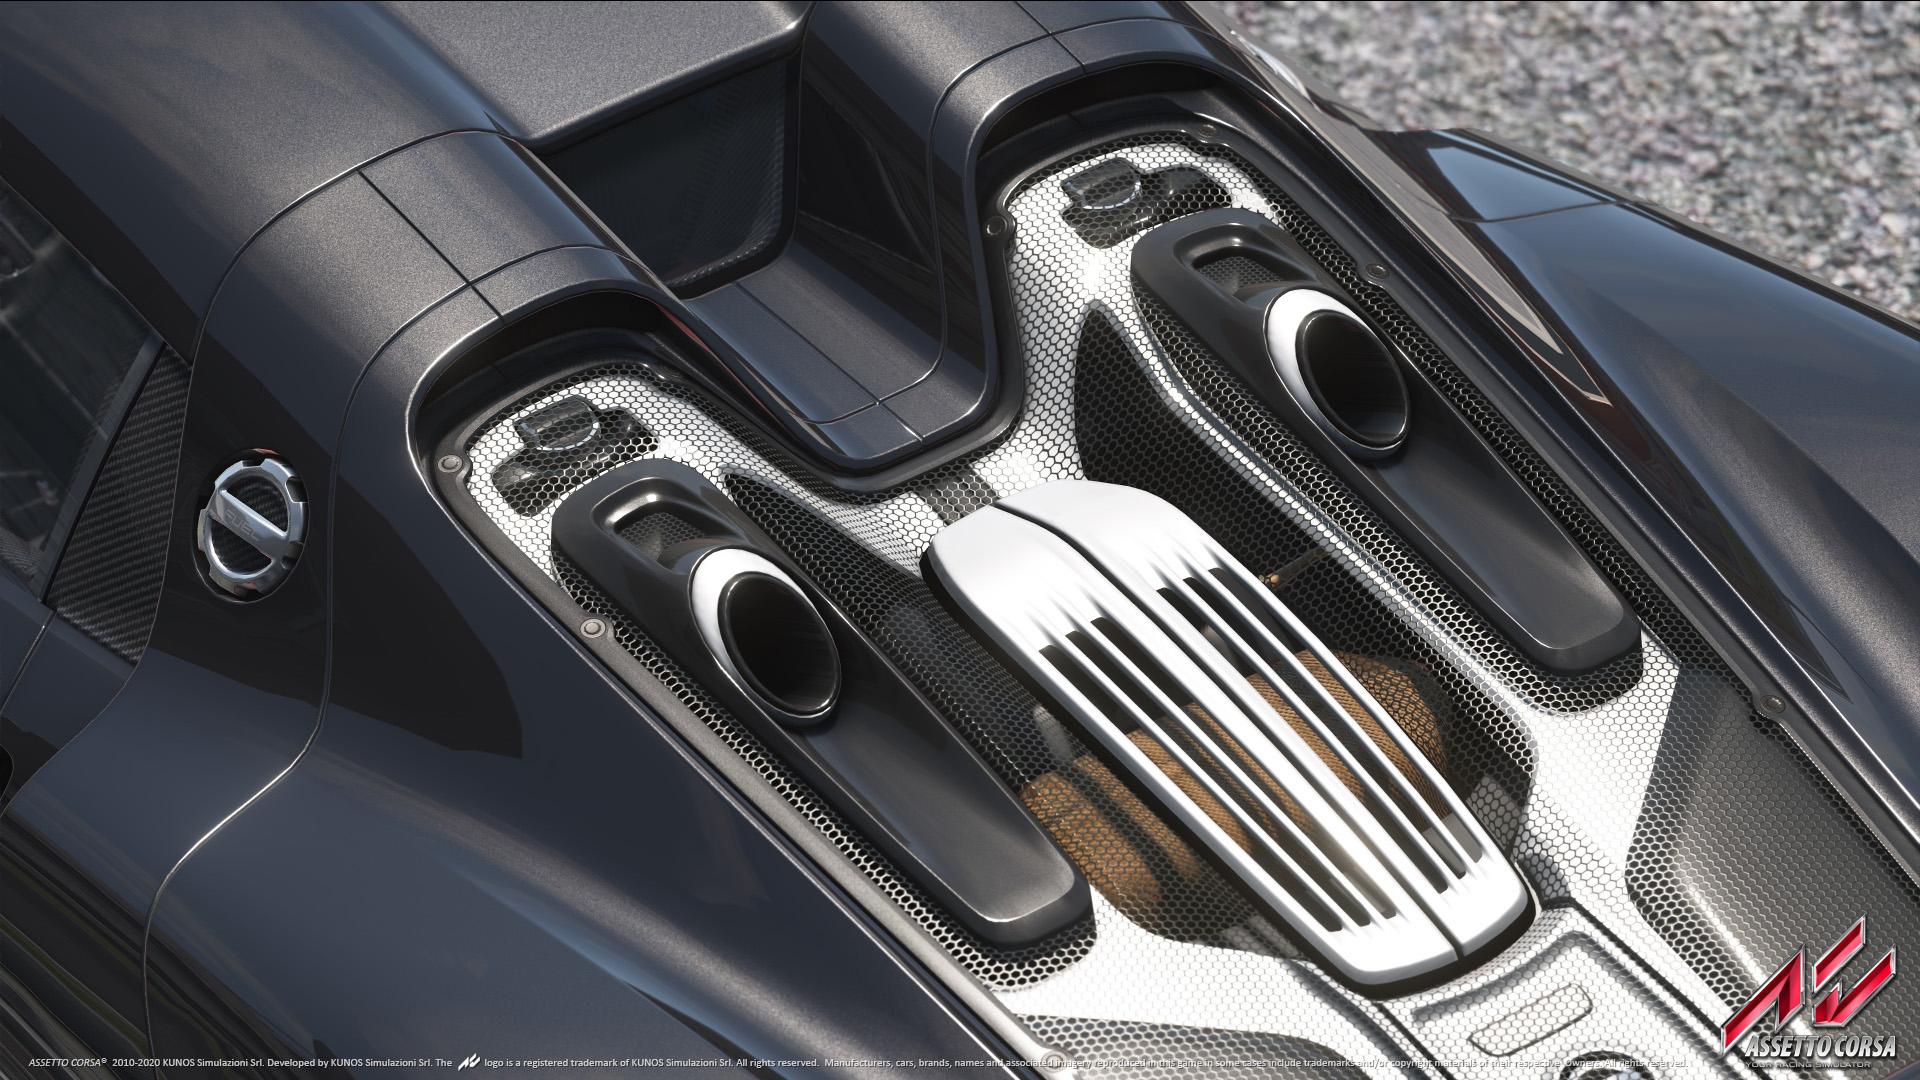 Assetto Corsa - Porsche Pack I PC Key Fiyatları